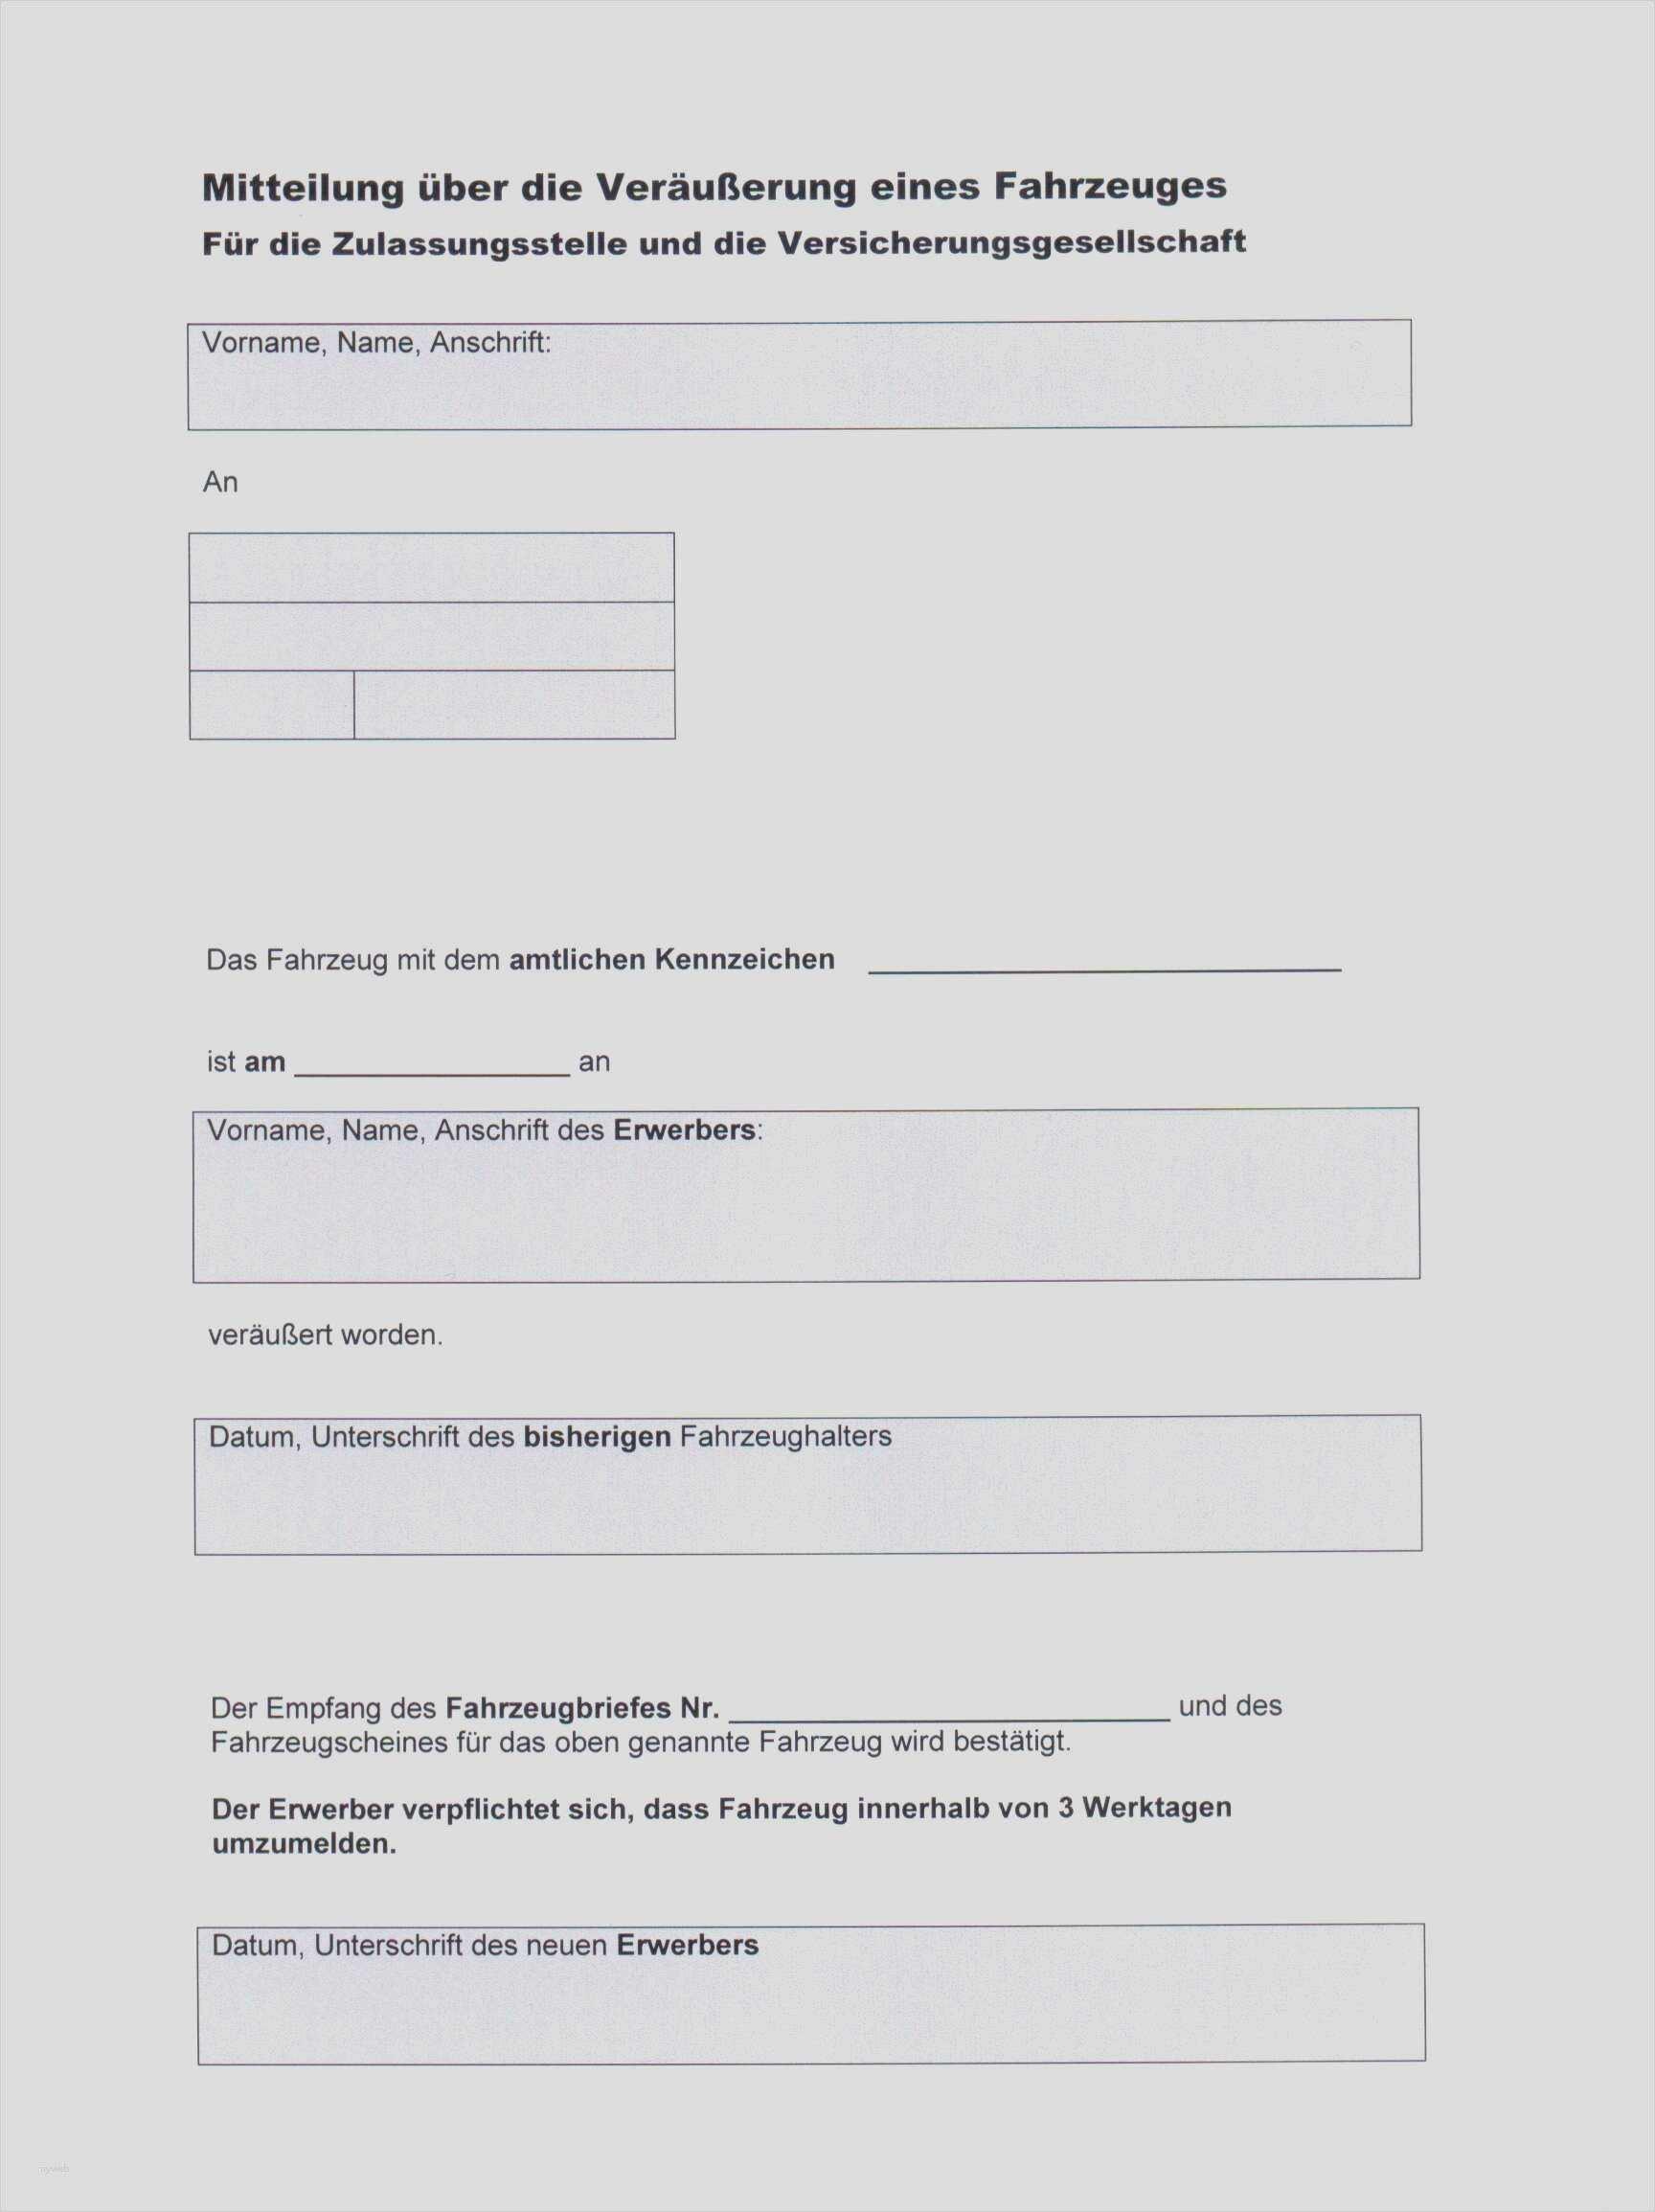 Adac Vollmacht Kfz Ausland / Muster Kaufvertrag Auto ...